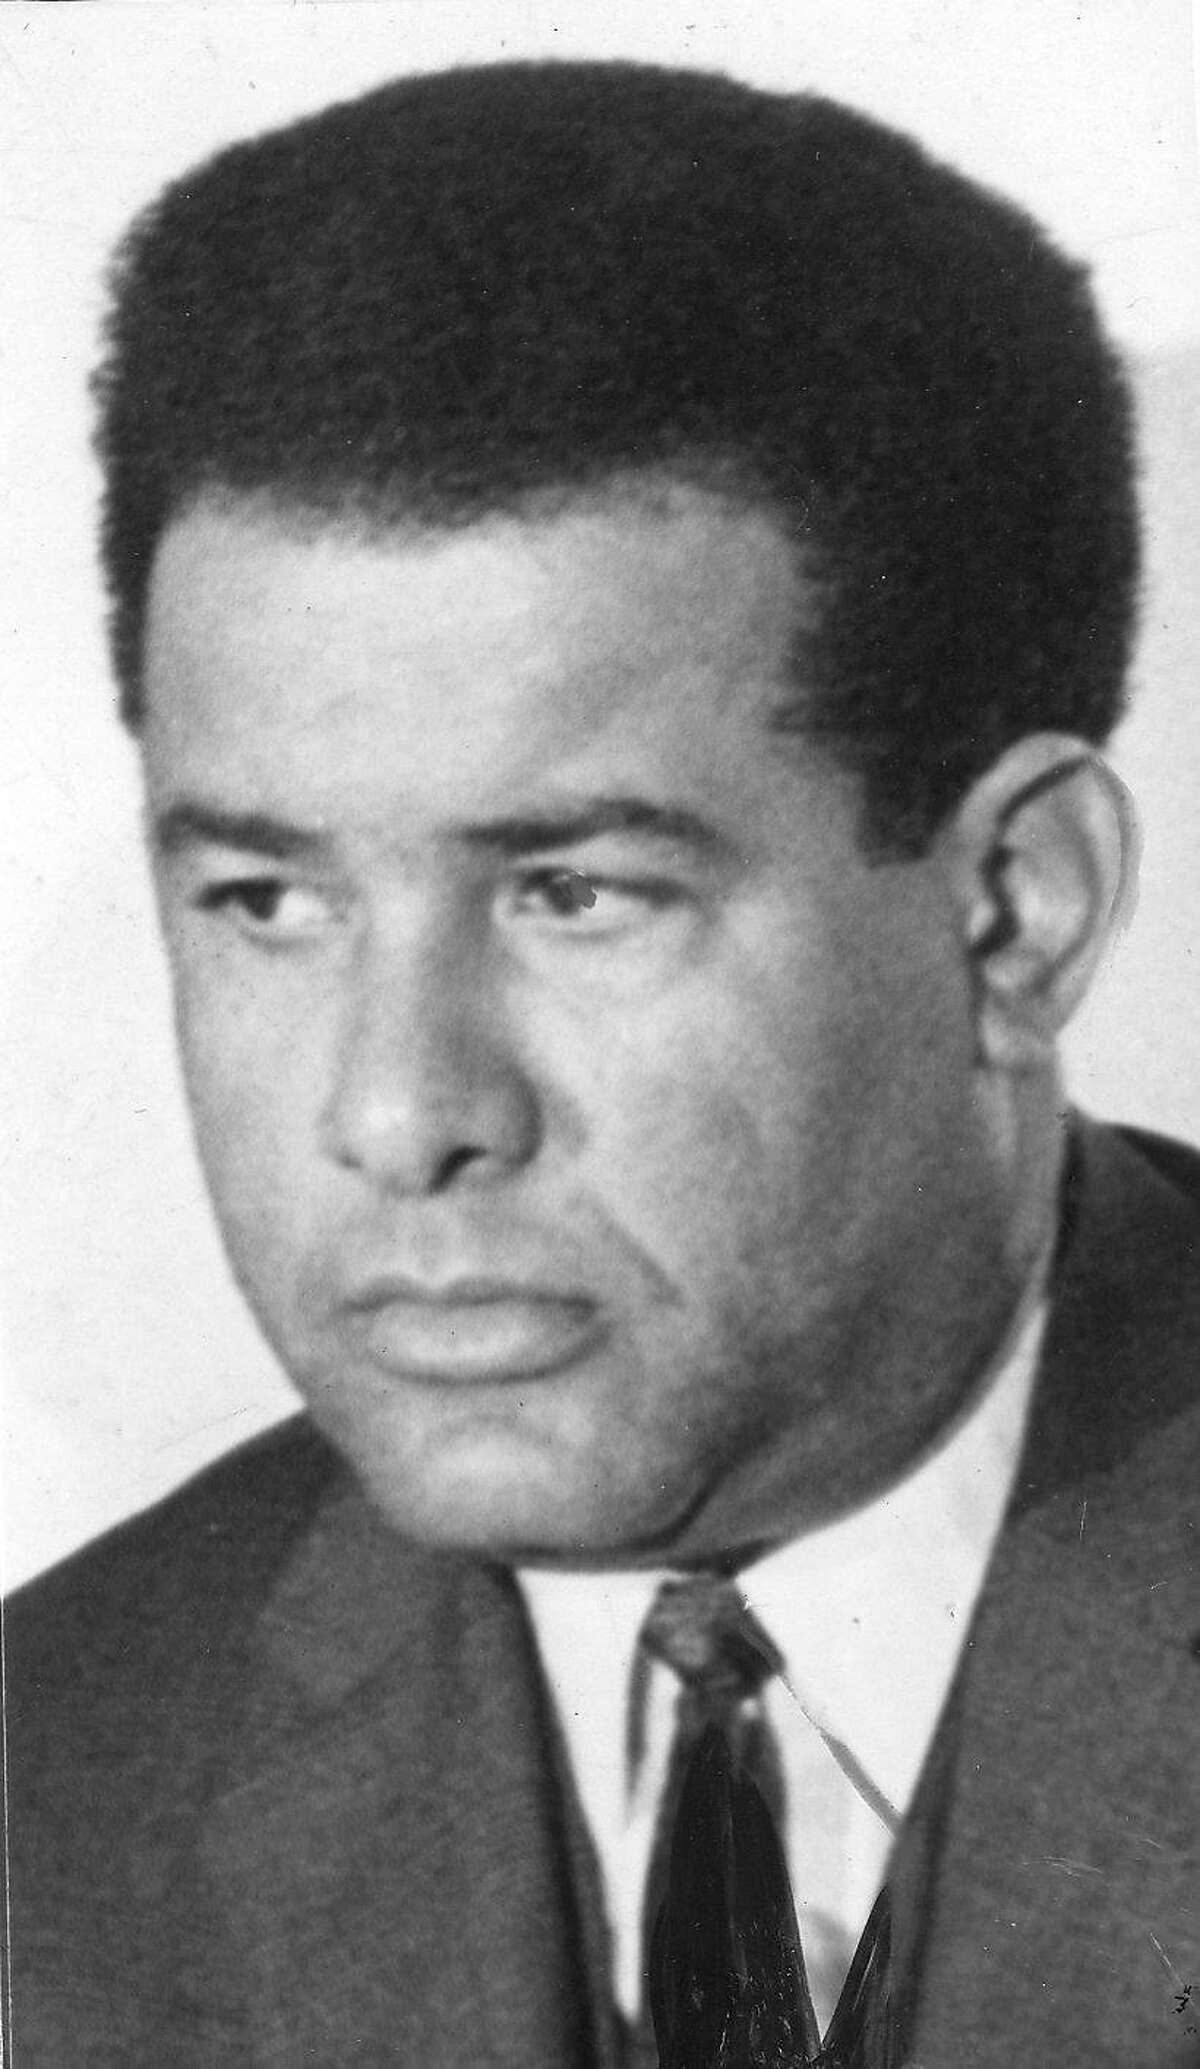 Dr. Price Cobbs,April 25, 1968 Photo ran 04/25/1968, p. 5